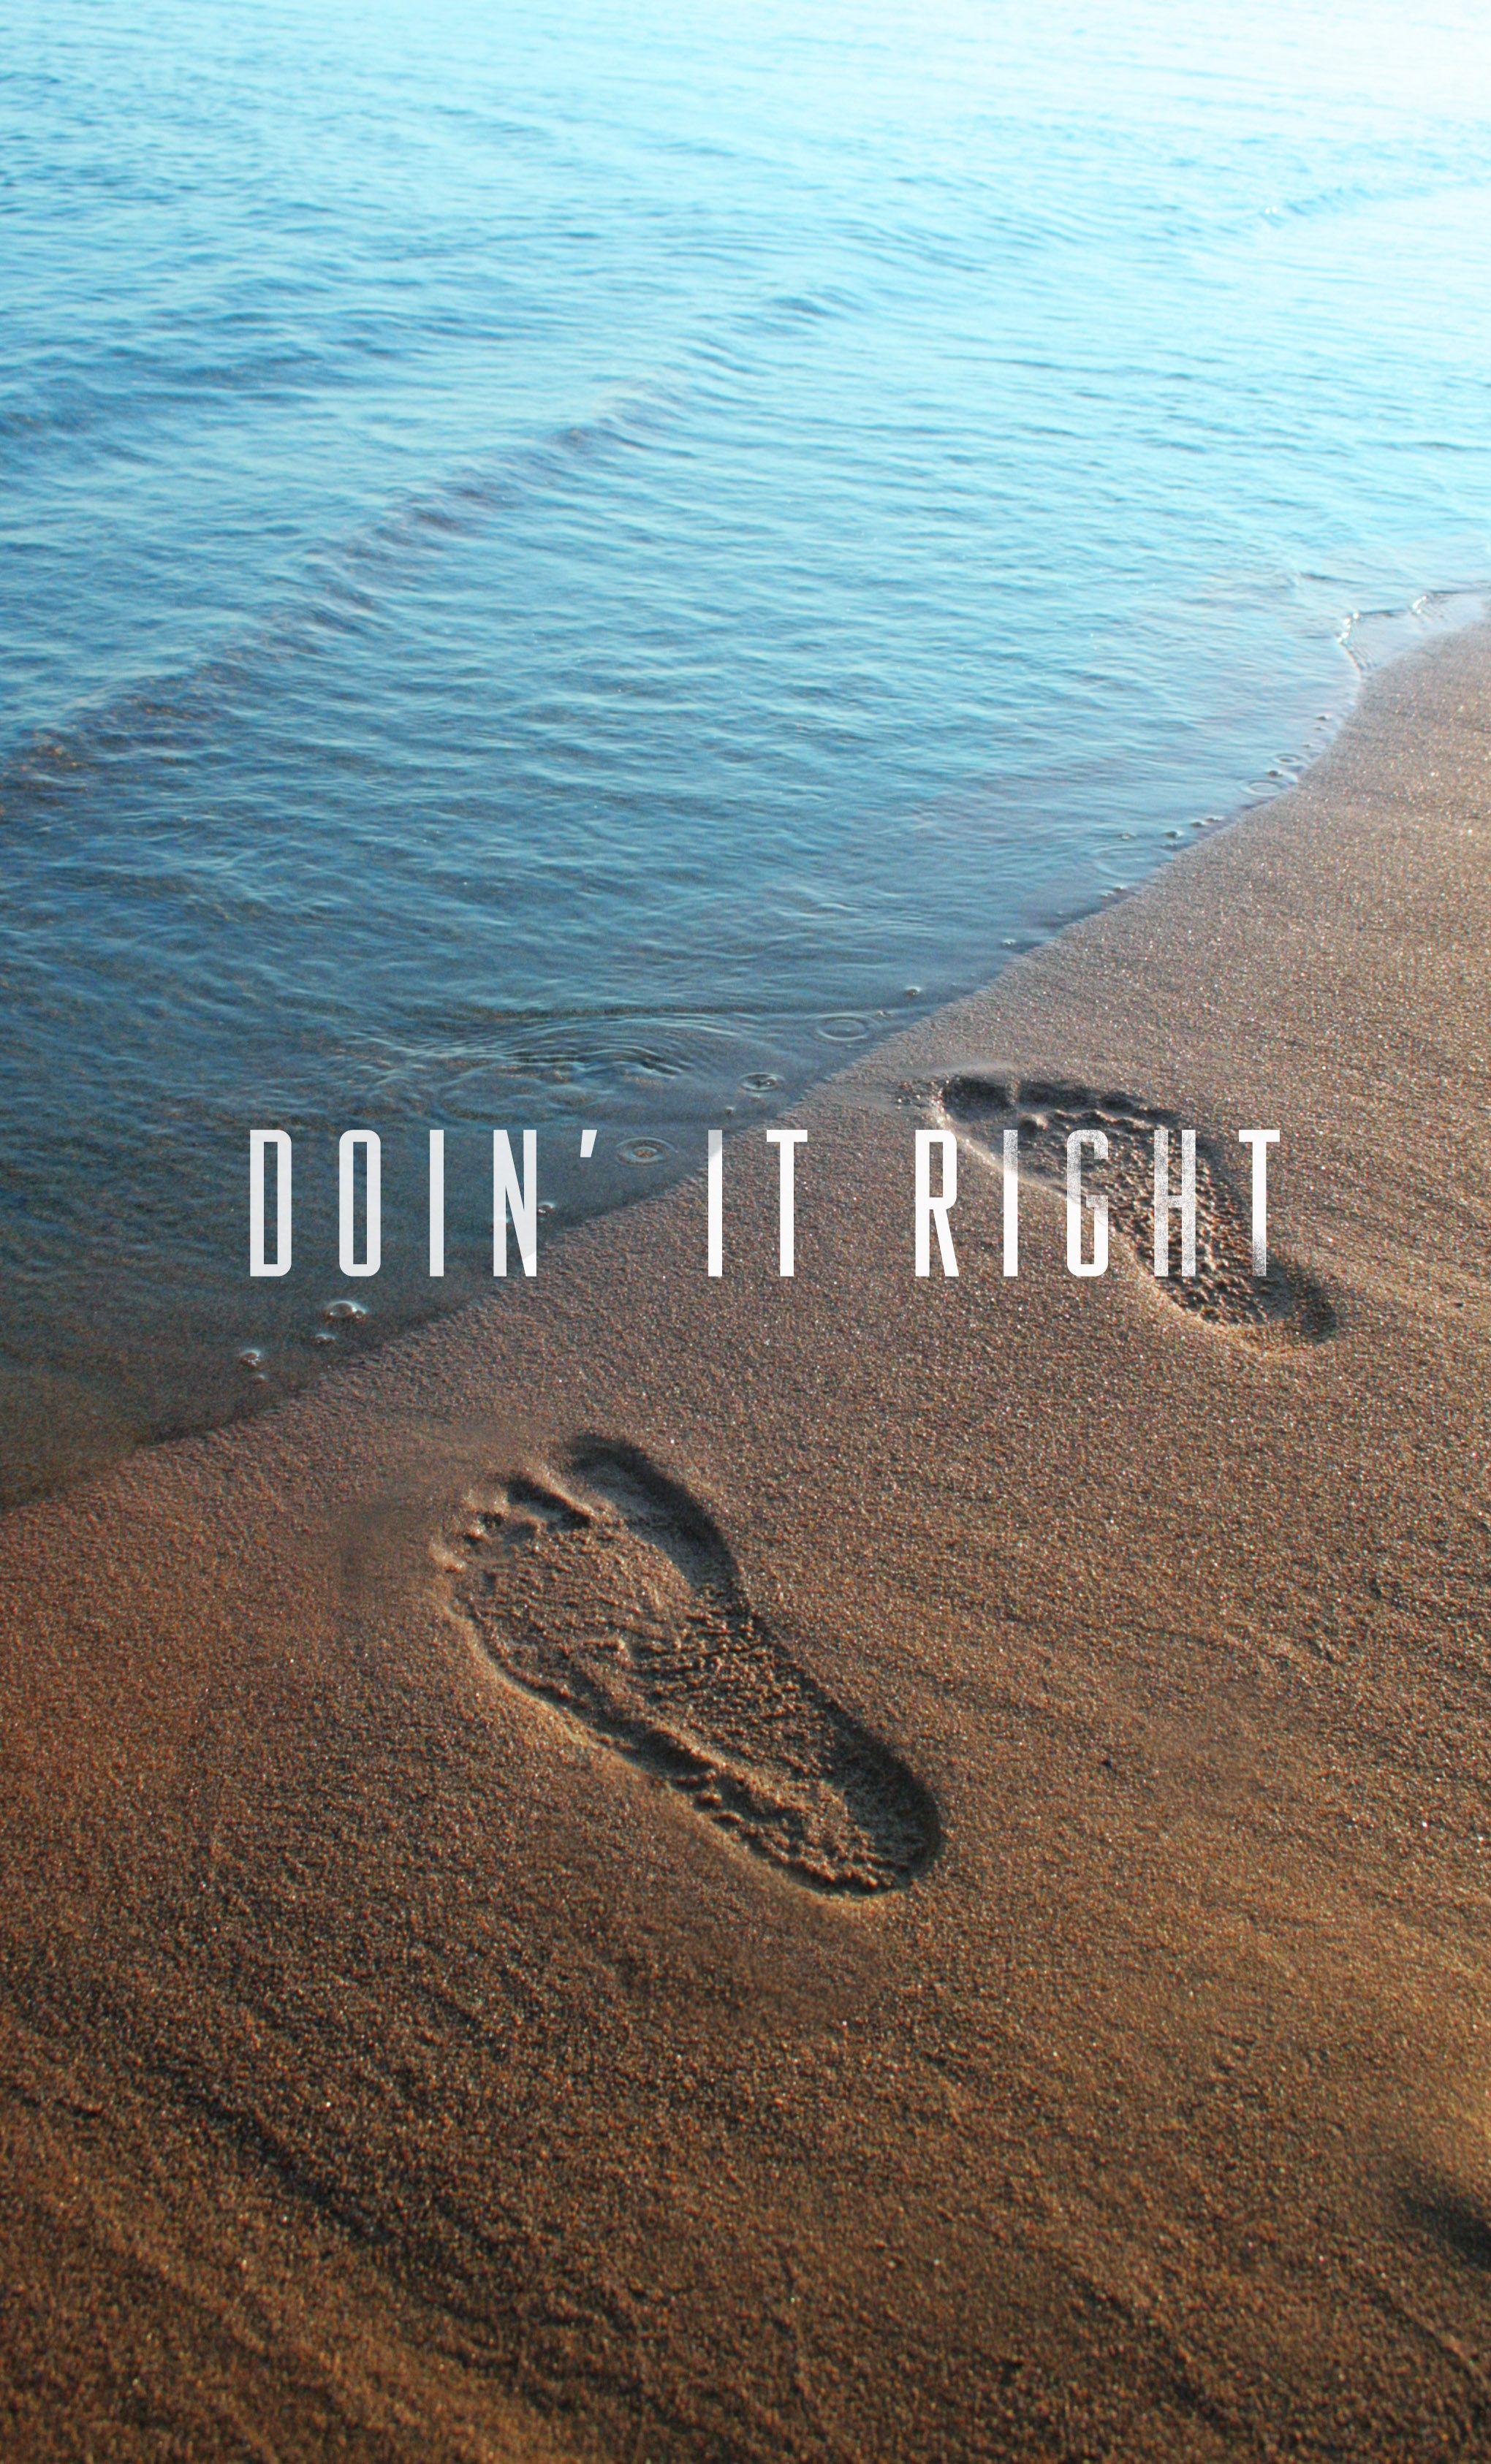 Doin' It Right